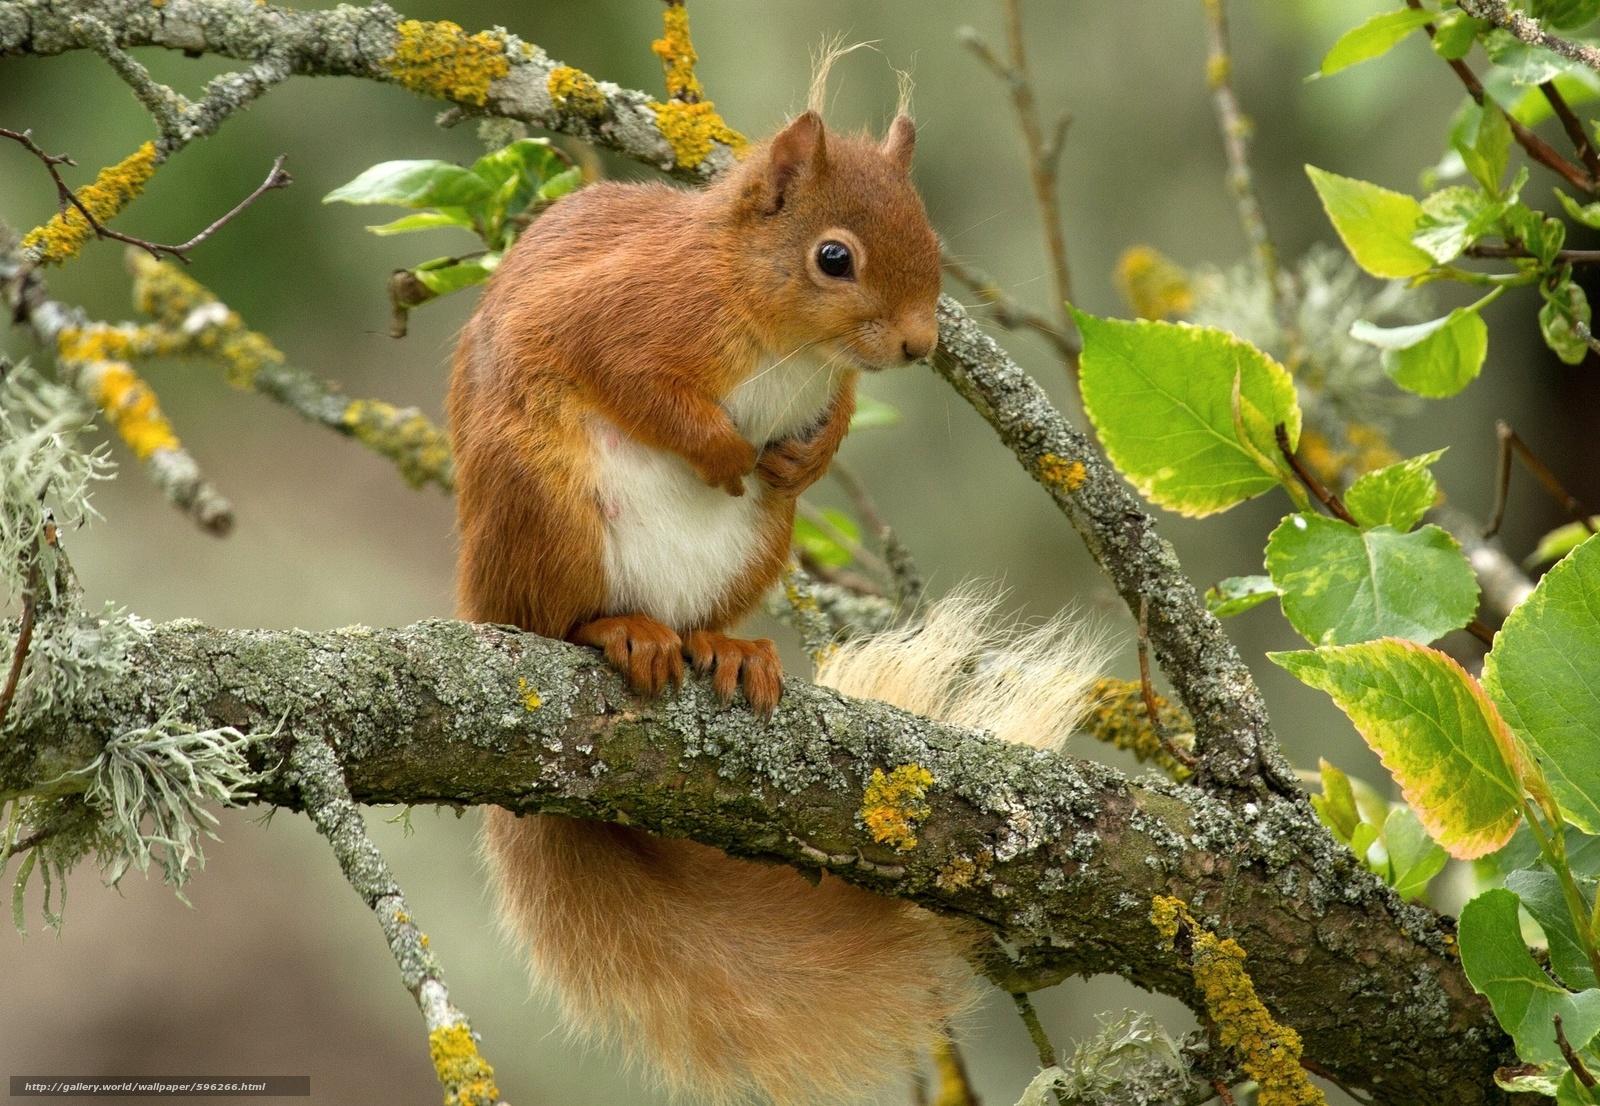 Tlcharger fond d 39 ecran cureuil roux arbre branch fonds for Bureau fond d ecran